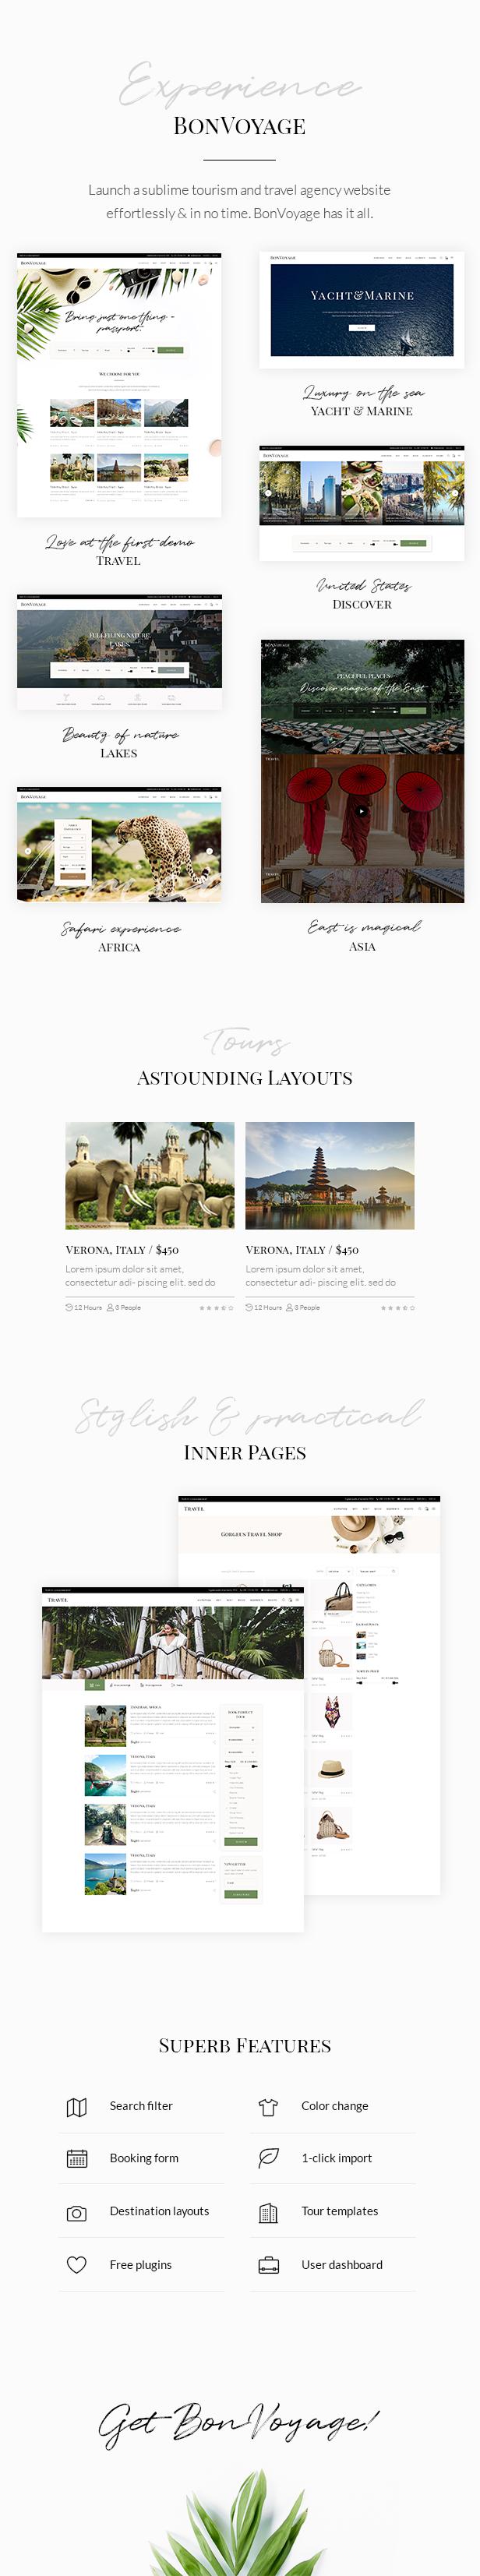 BonVoyage - Travel Agency and Tour Theme - 1